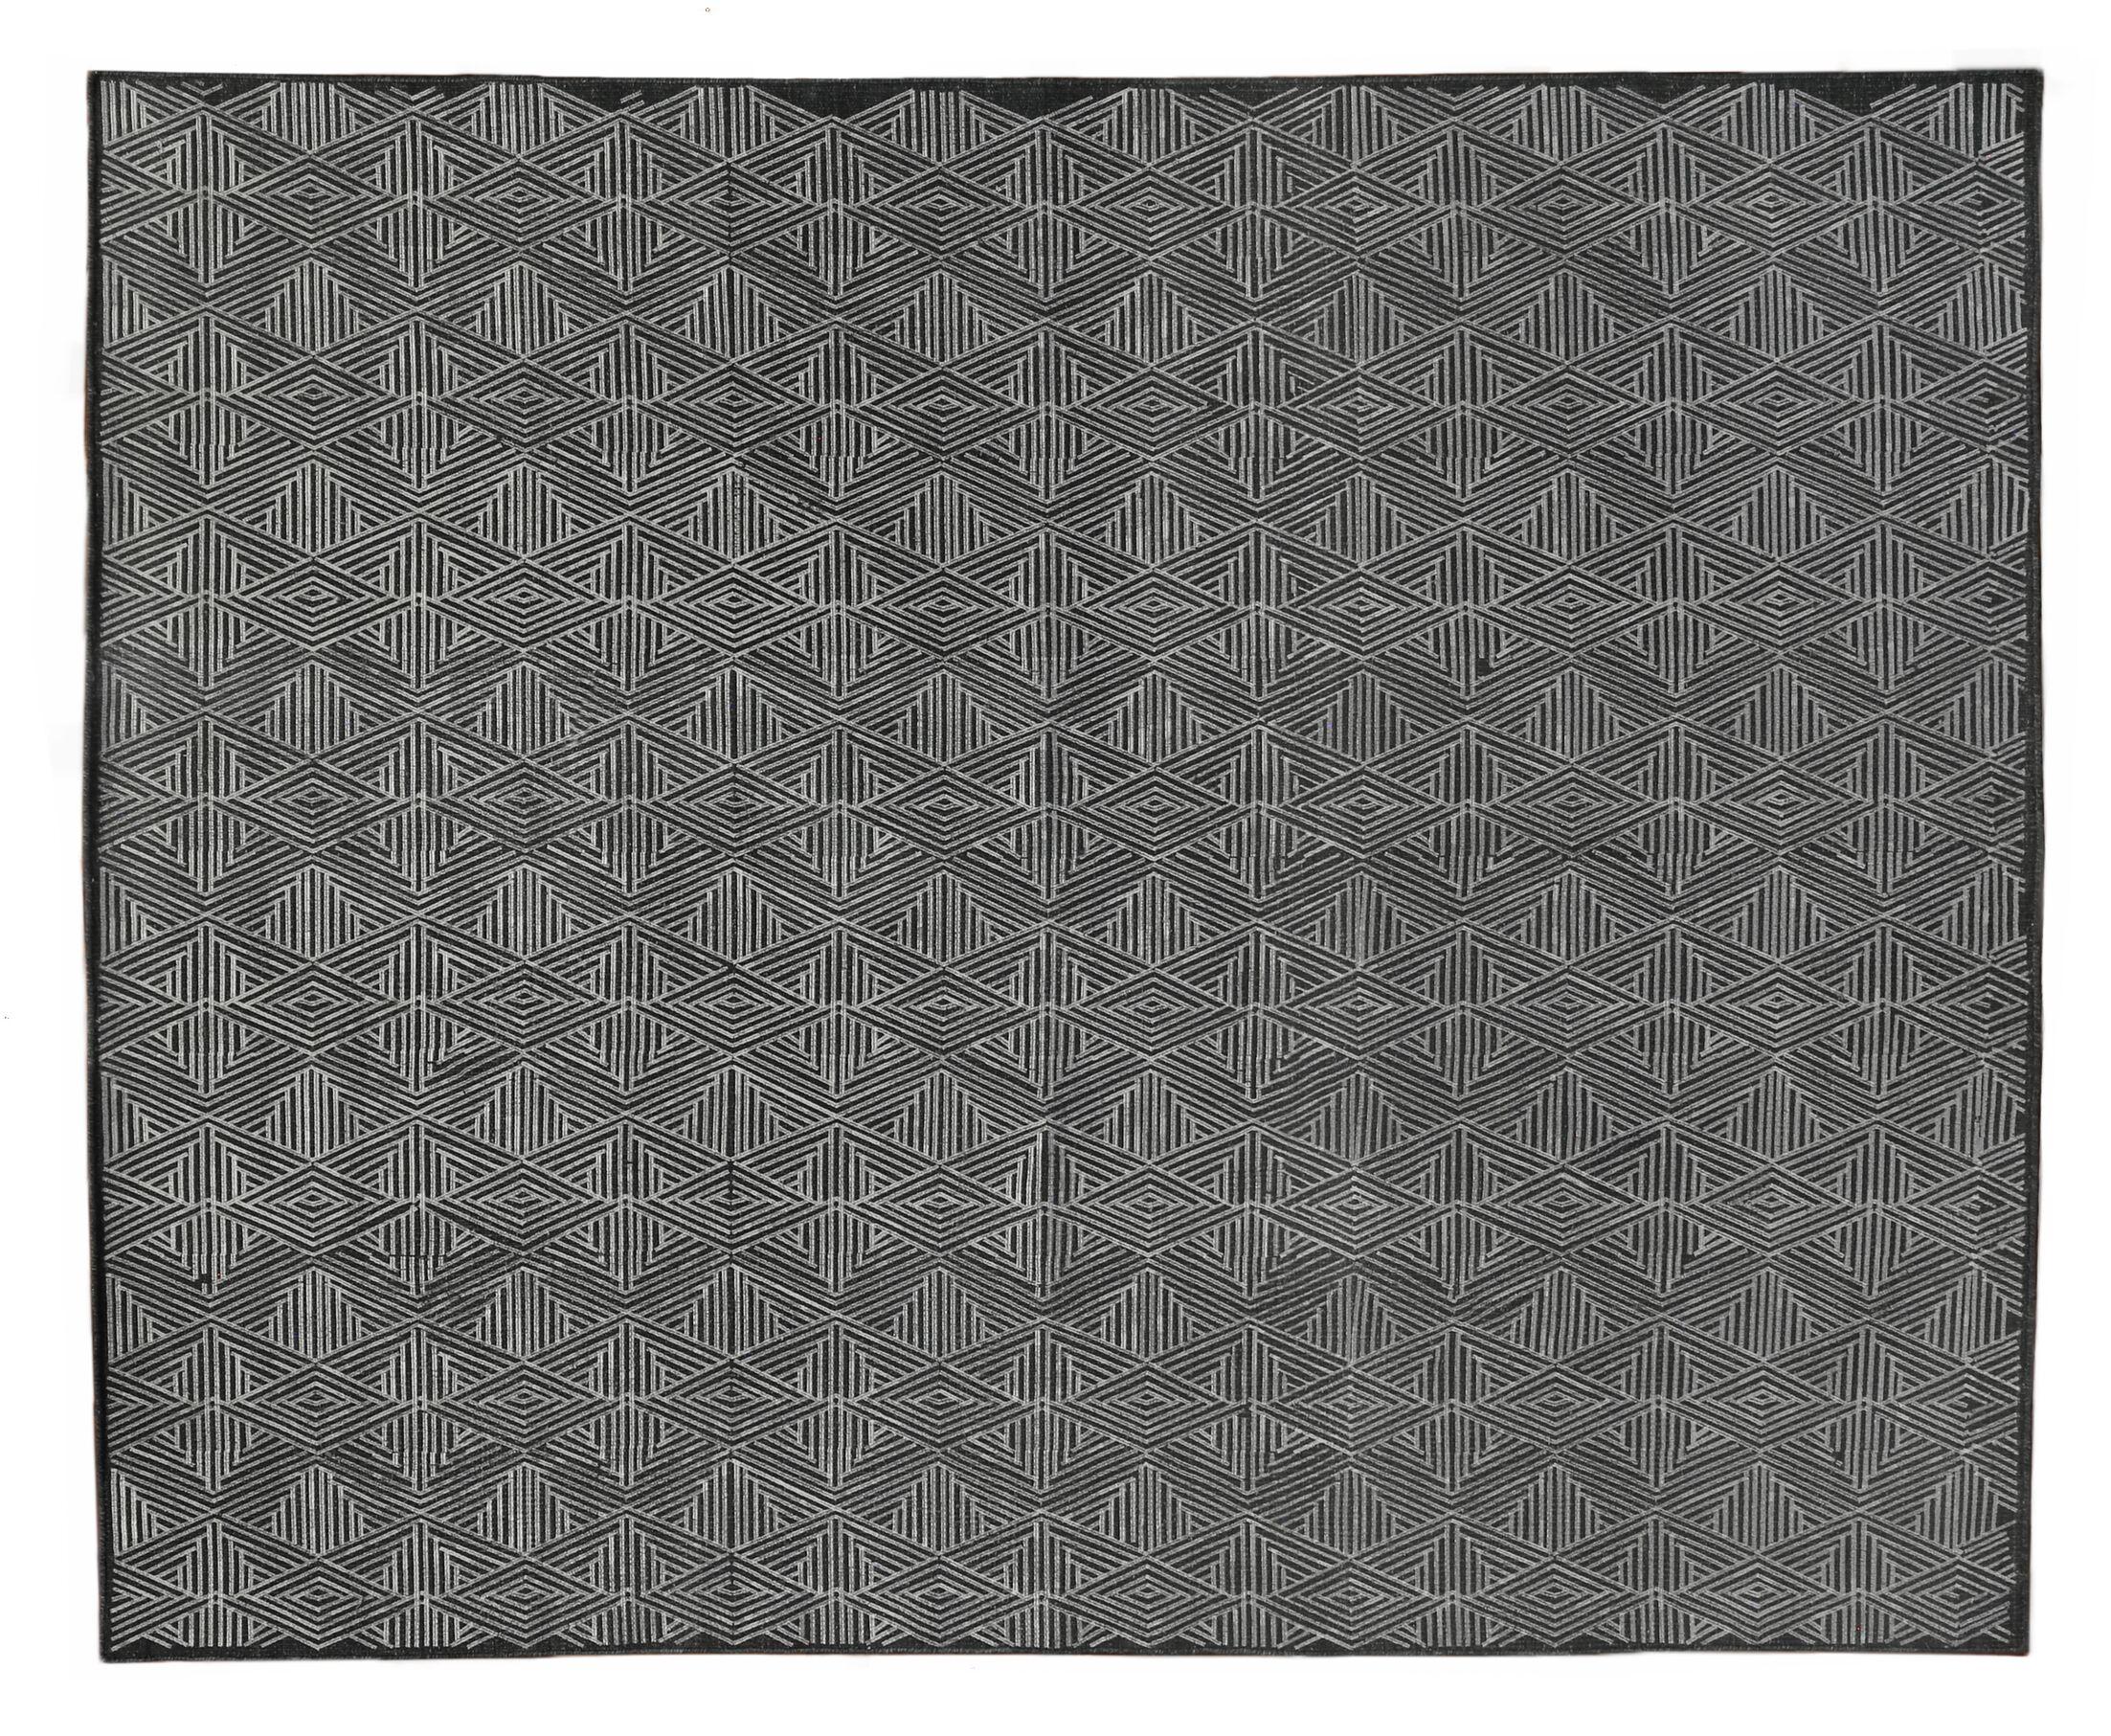 Pavillion Hand-Woven Wool Charcoal Area Rug Rug Size: Rectangle 5' x 8'